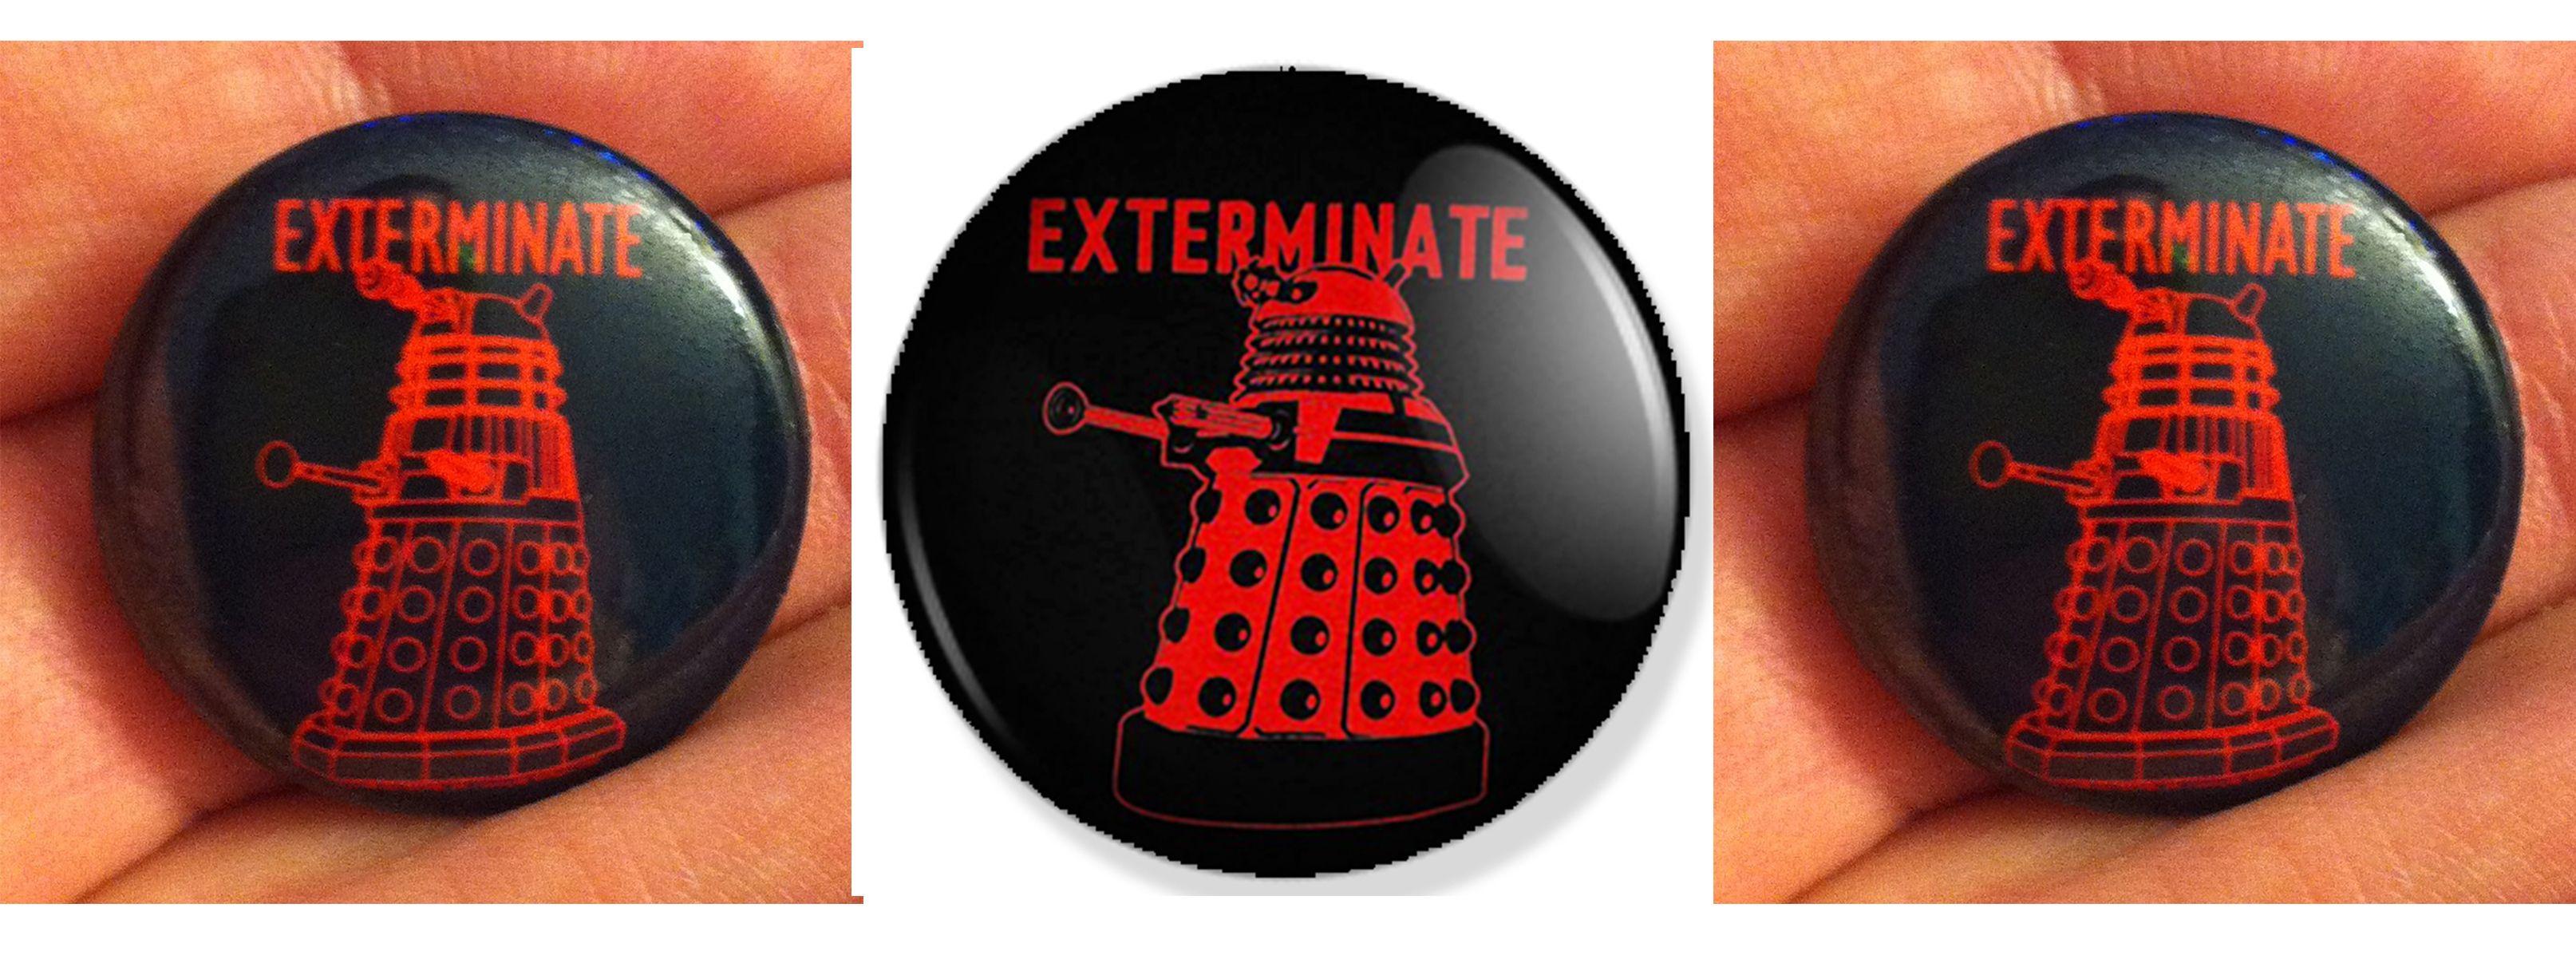 DOCTOR WHO, DALEK, EXTERMINATE BUTTON BADGE, BLACK